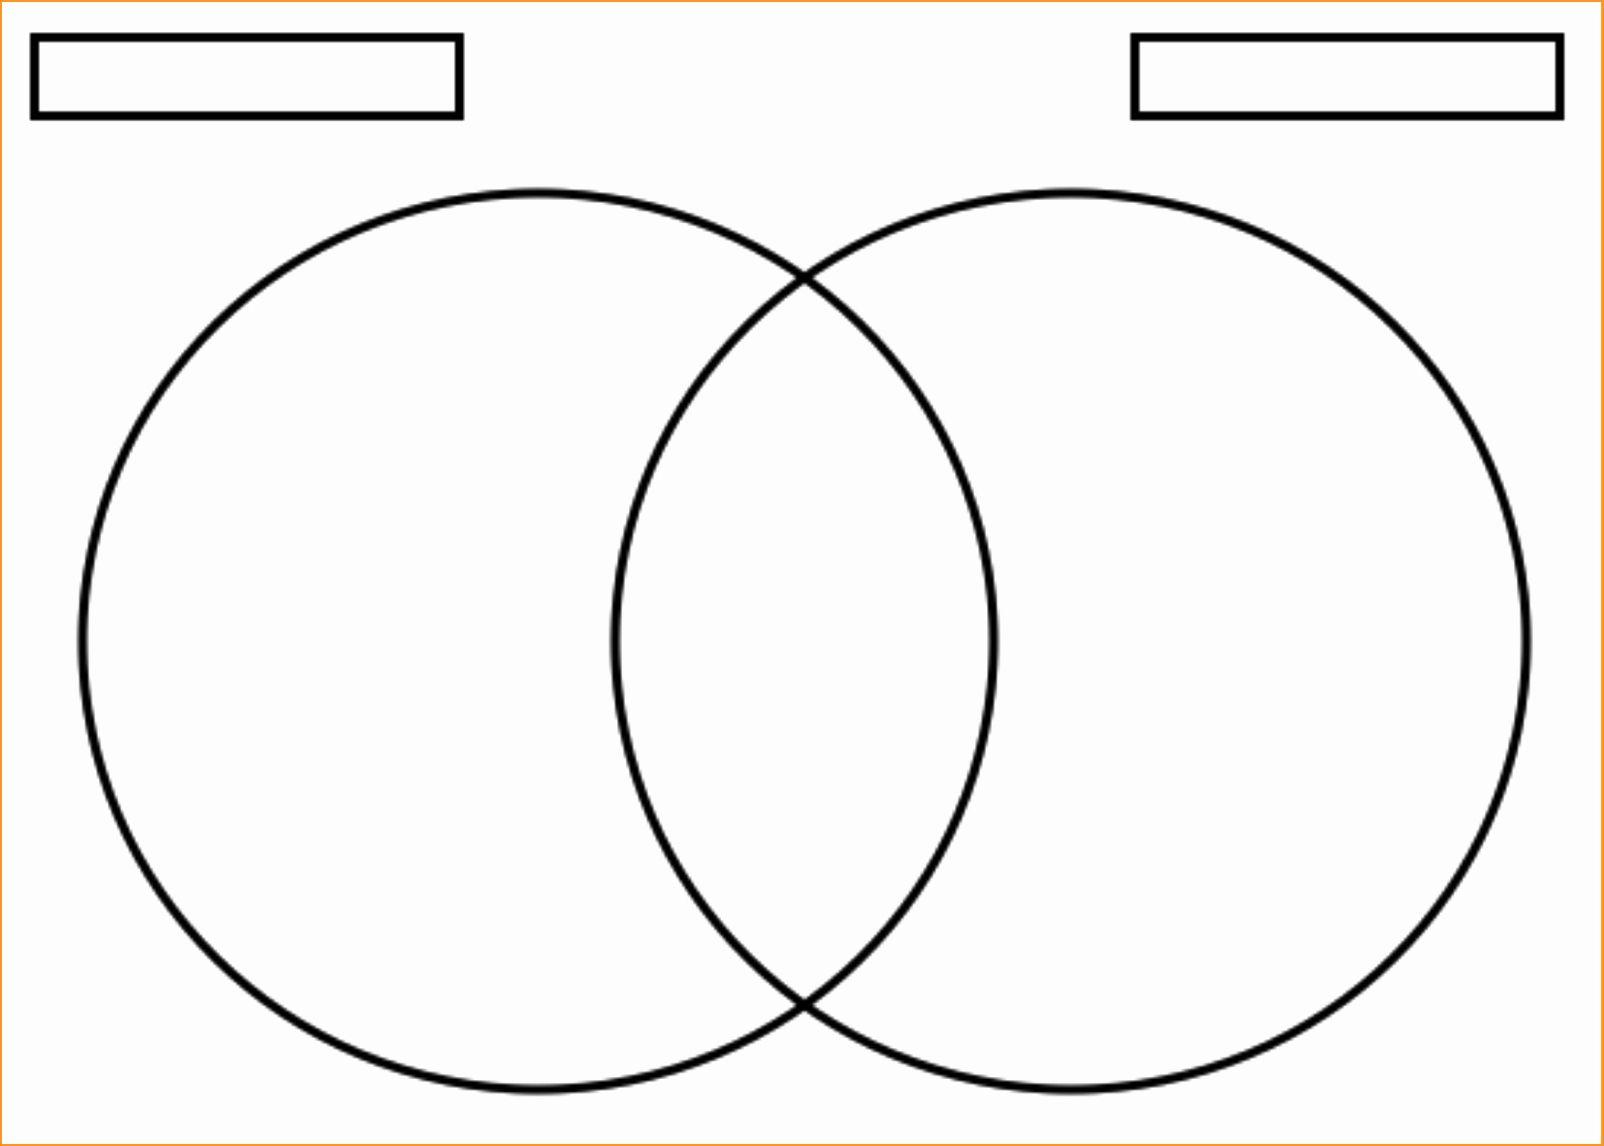 Venn Diagram To Print Luxury Venn Diagram Template In